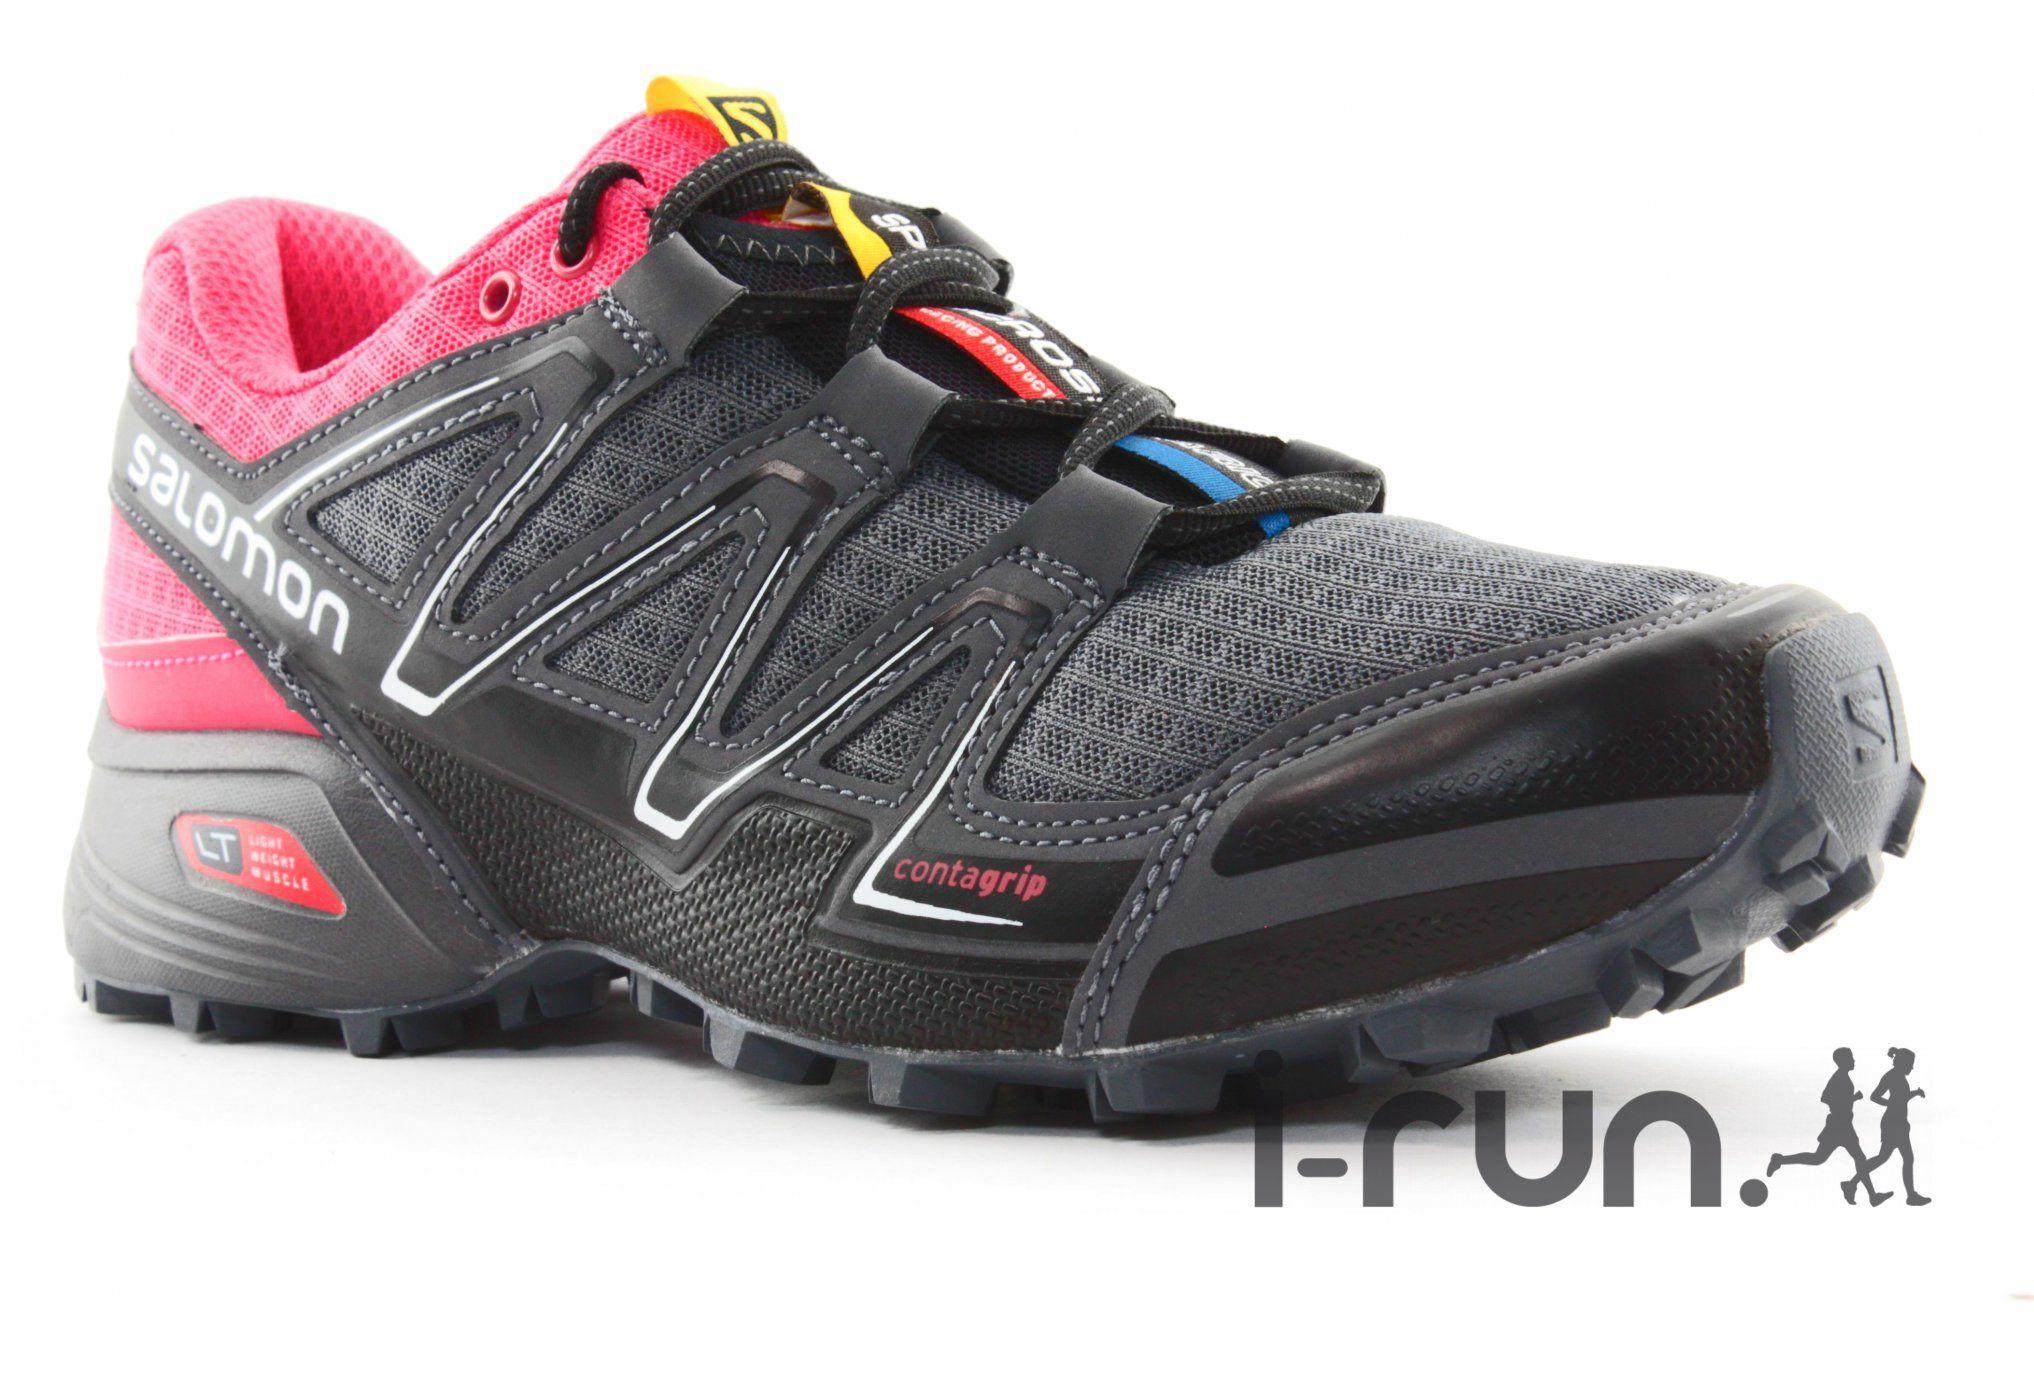 a39d0030430 Salomon SPEEDCROSS Vario W pas cher - Chaussures running femme running Trail  en promo